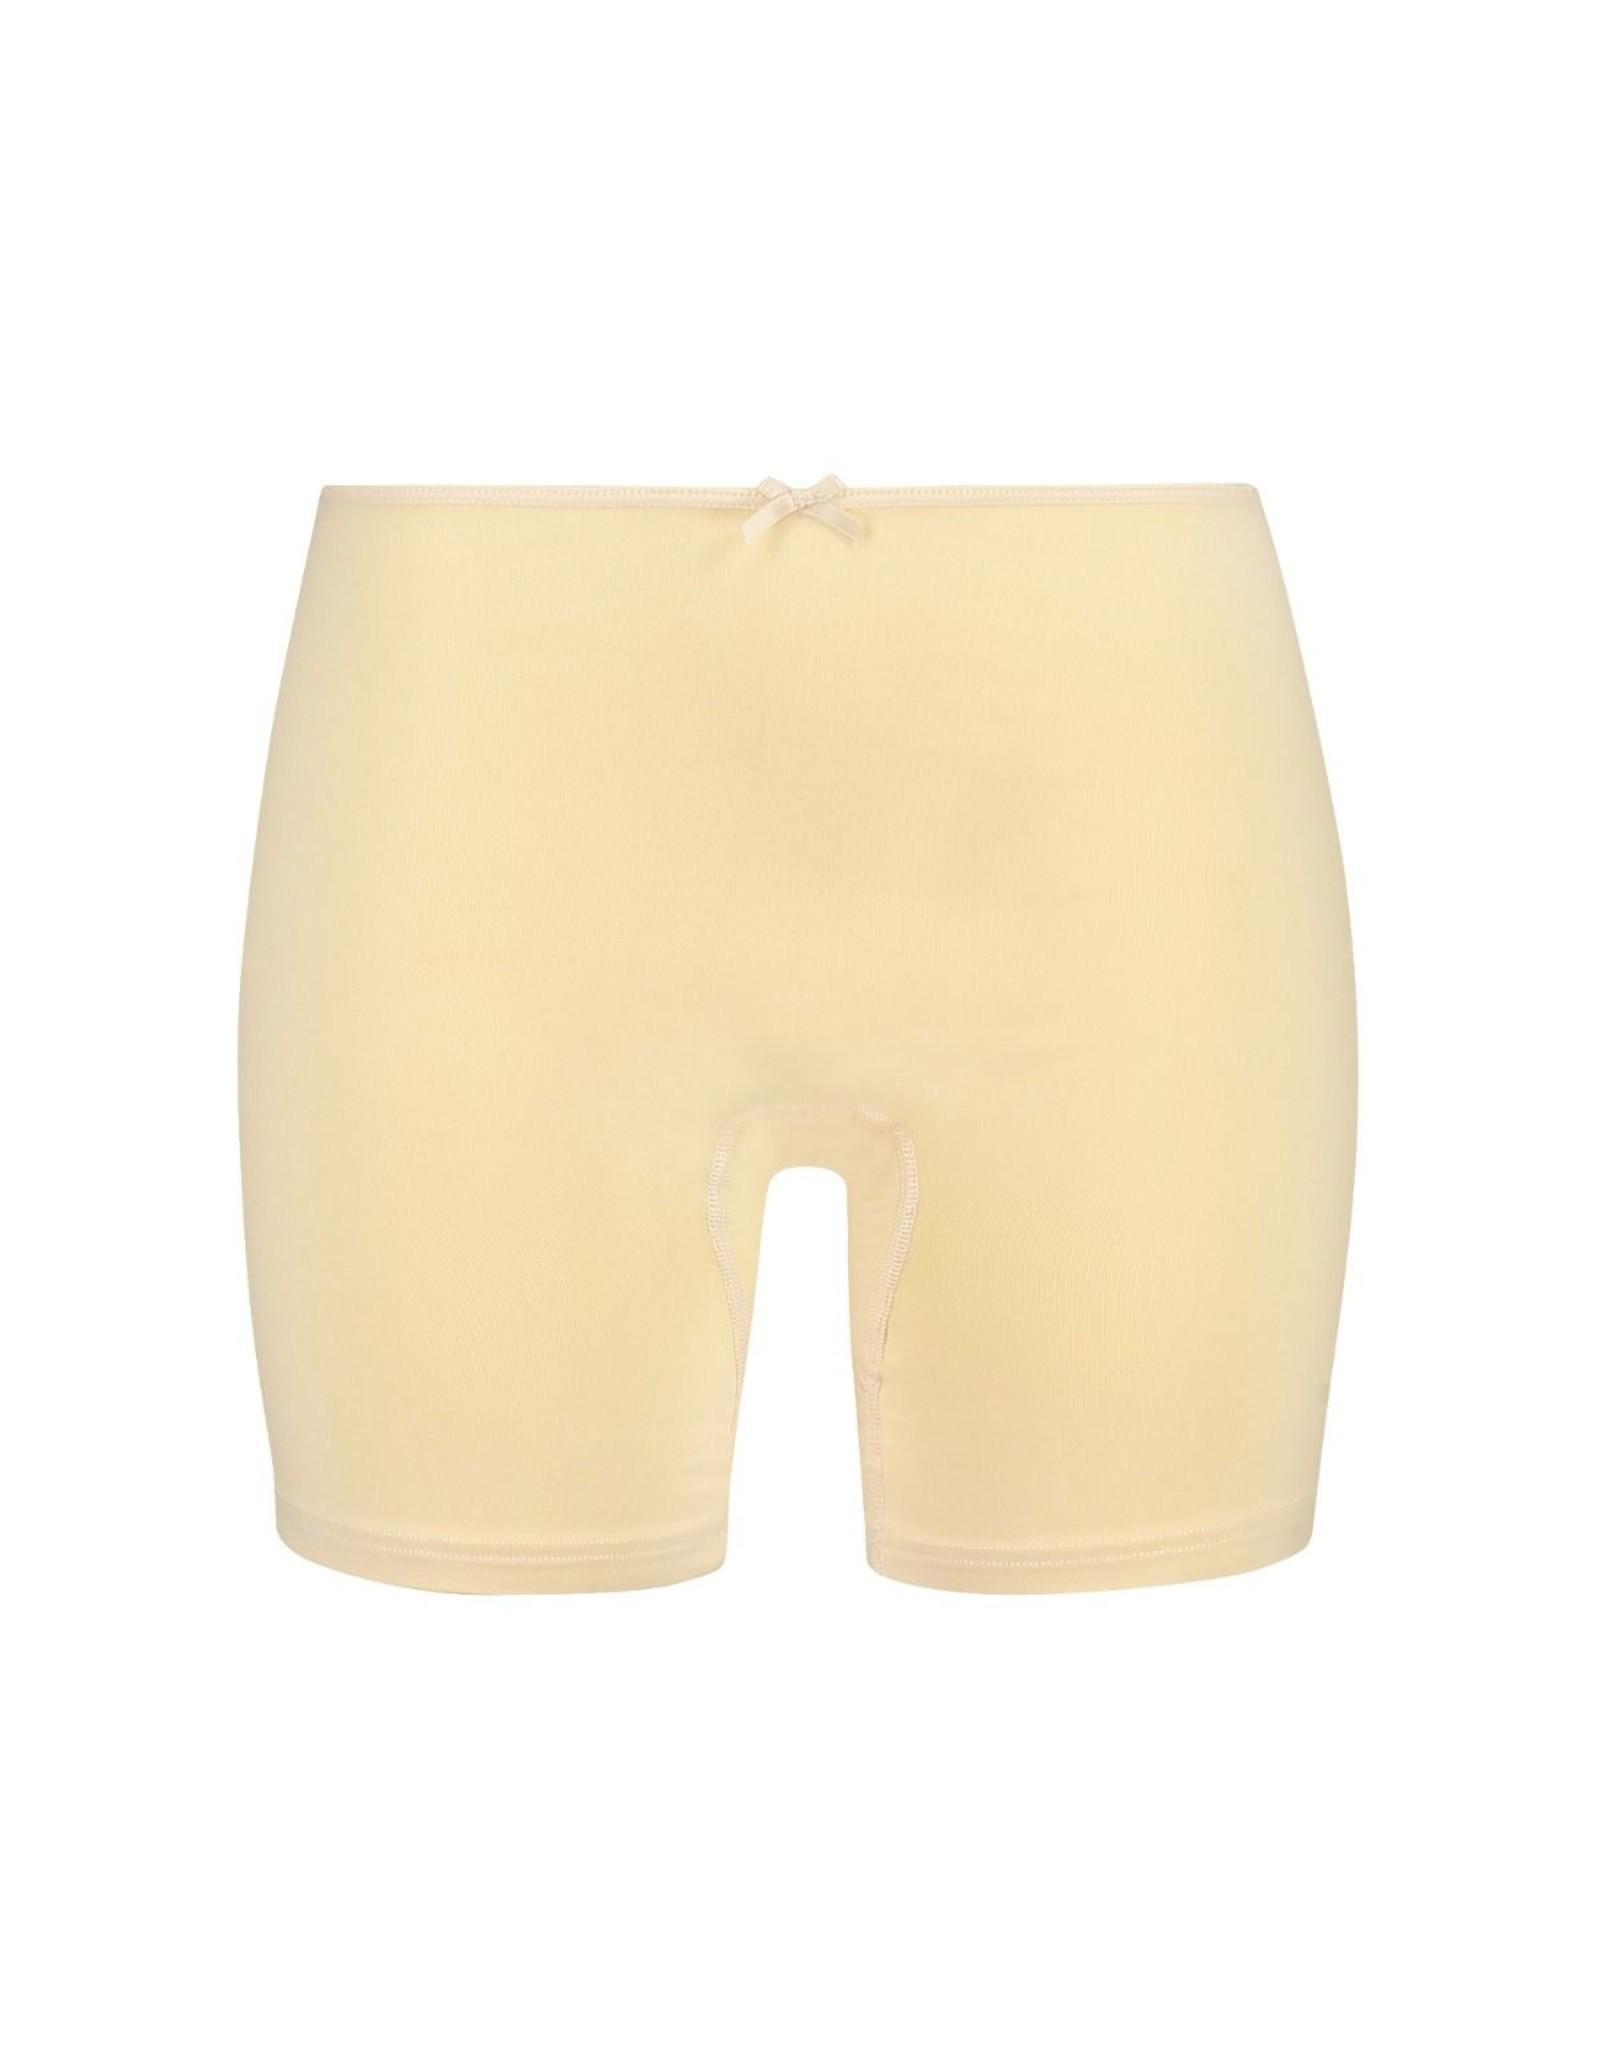 RJ Bodywear Long Brief Pure Color huidskleur